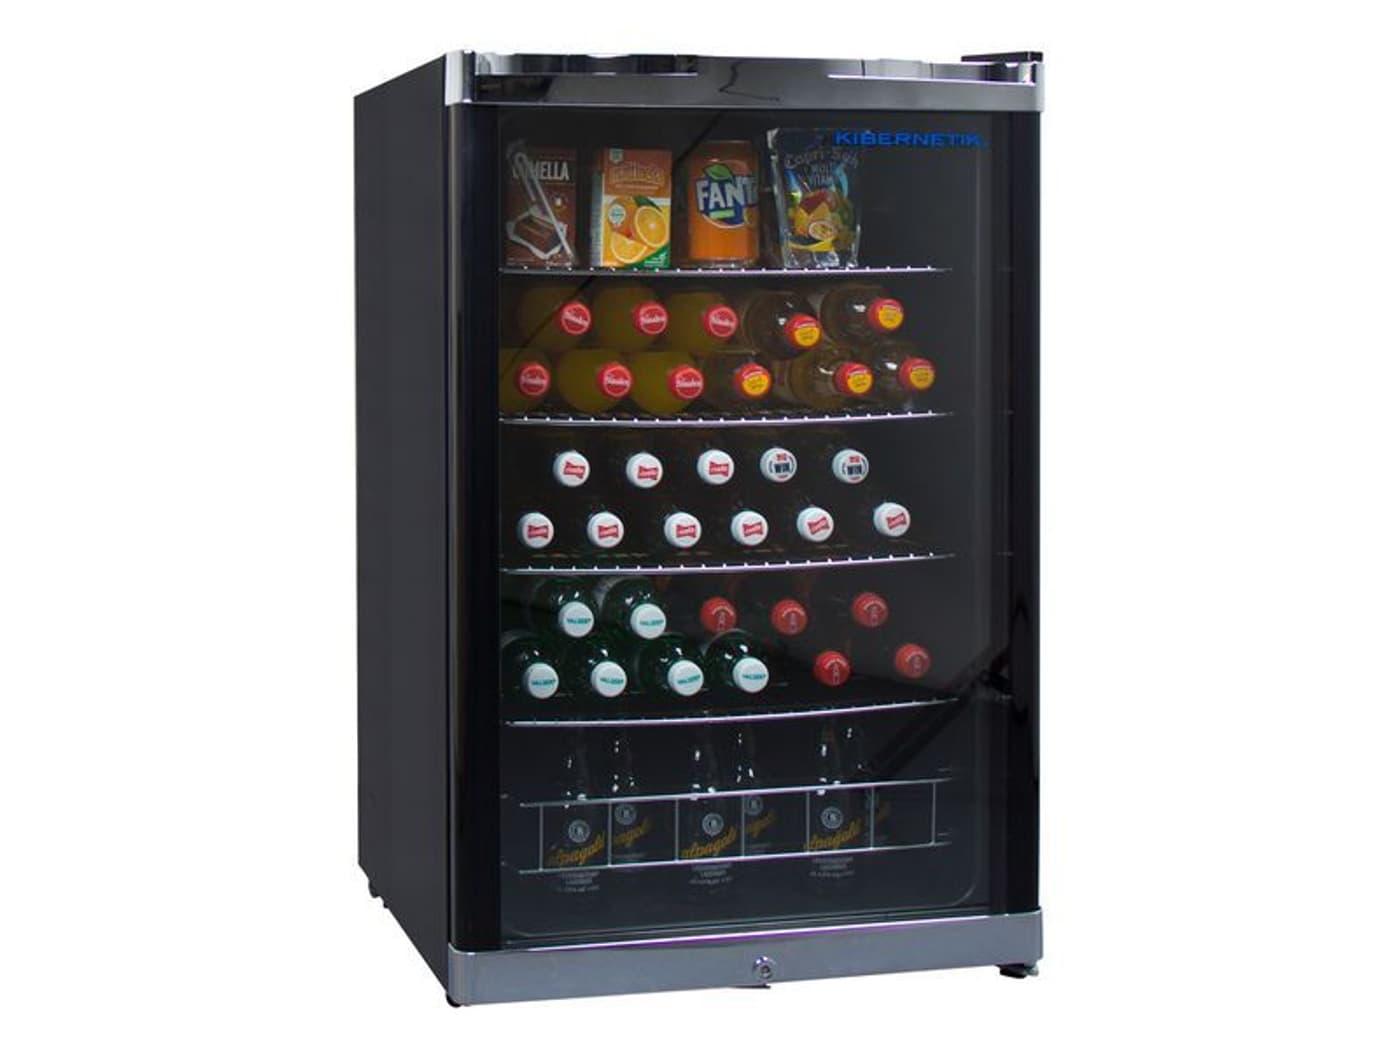 Bosch Kühlschrank Ersatzteile Schweiz : Kibernetik gk l kühlschrank migros